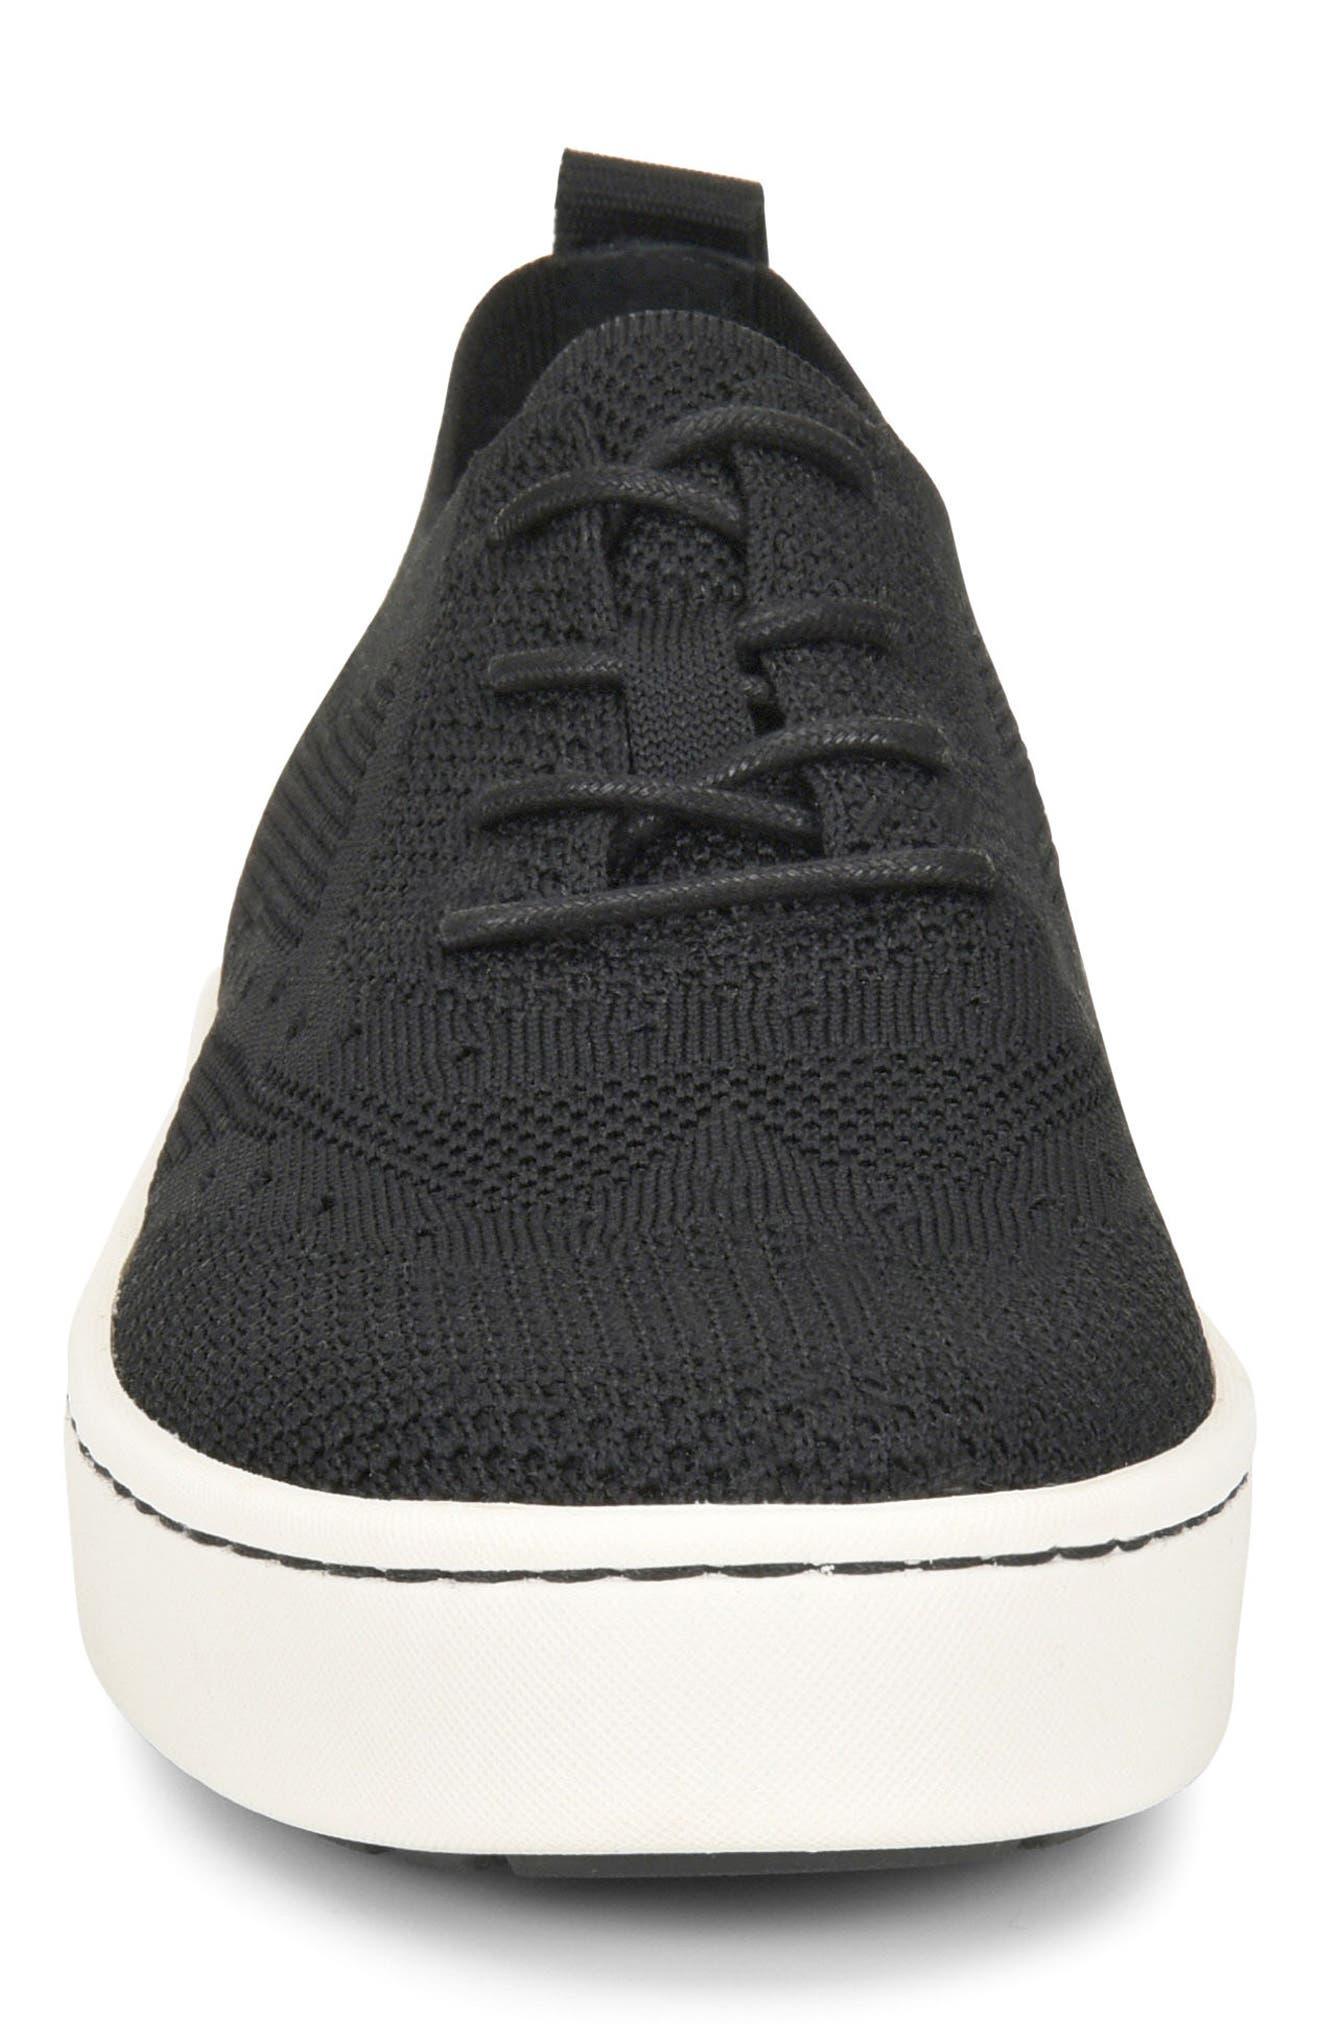 Bearse Sneaker,                             Alternate thumbnail 4, color,                             Black Knit